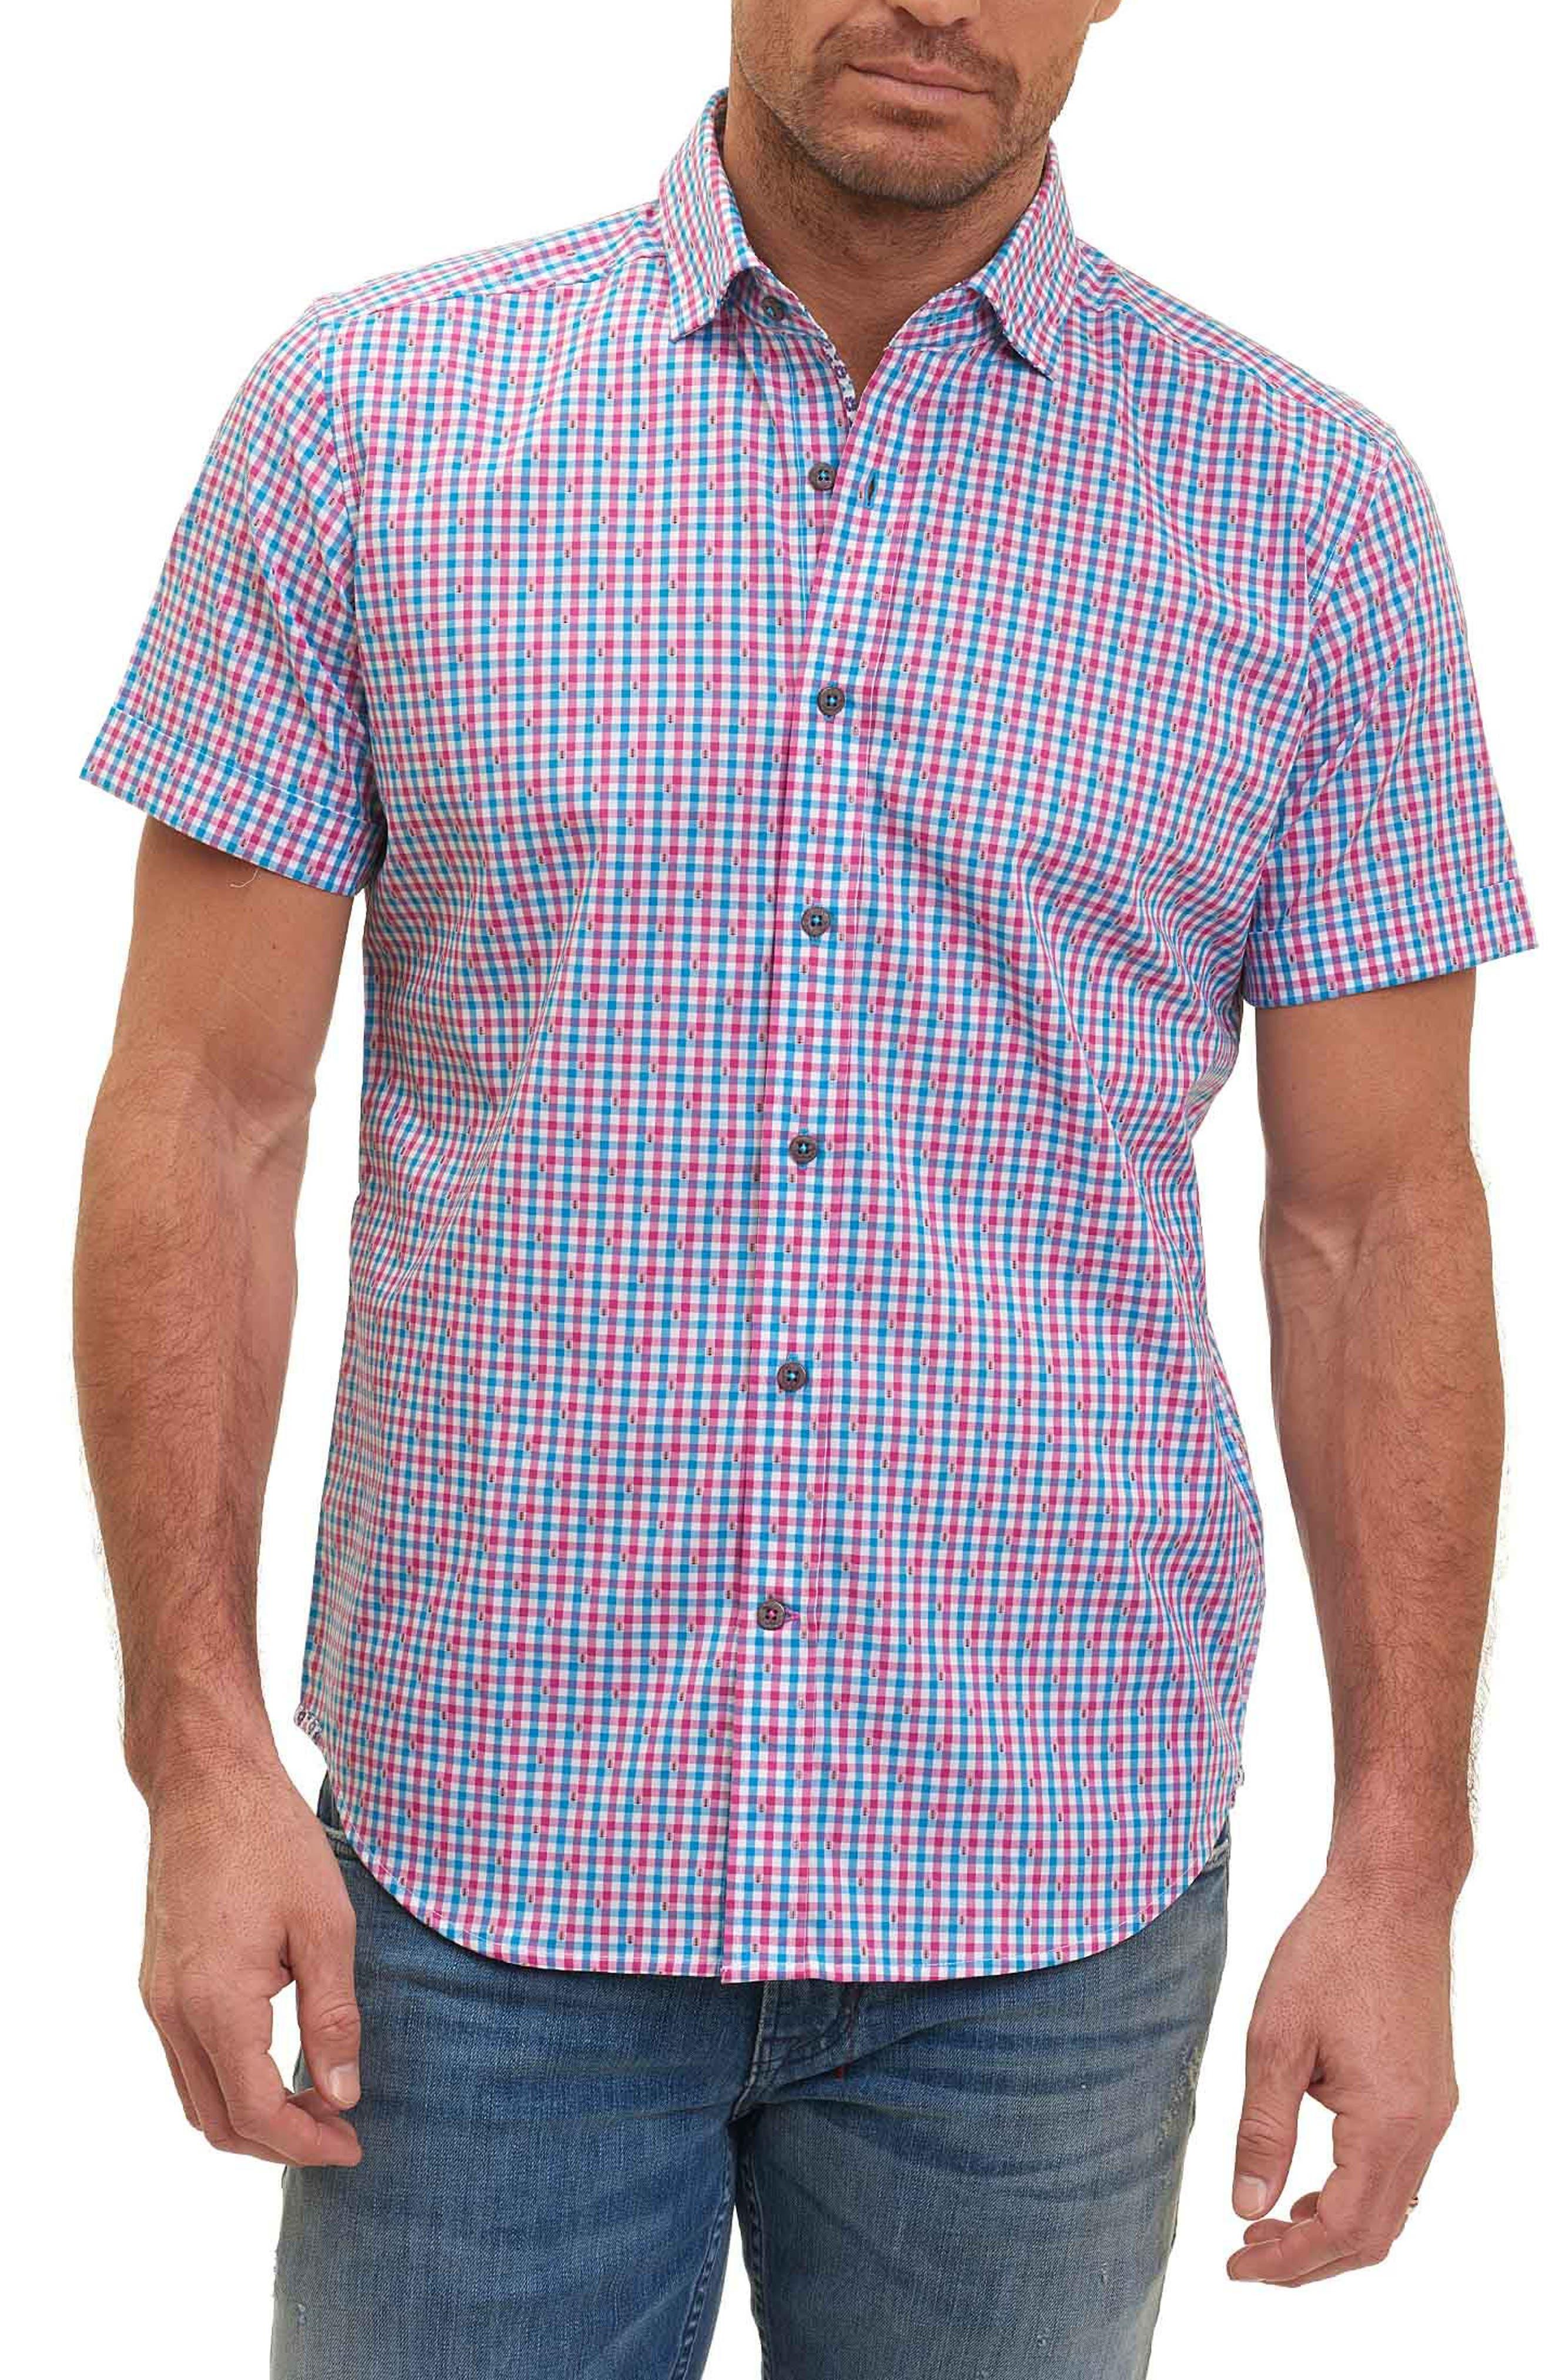 Makai Tailored Fit Gingham Sport Shirt,                             Main thumbnail 1, color,                             460